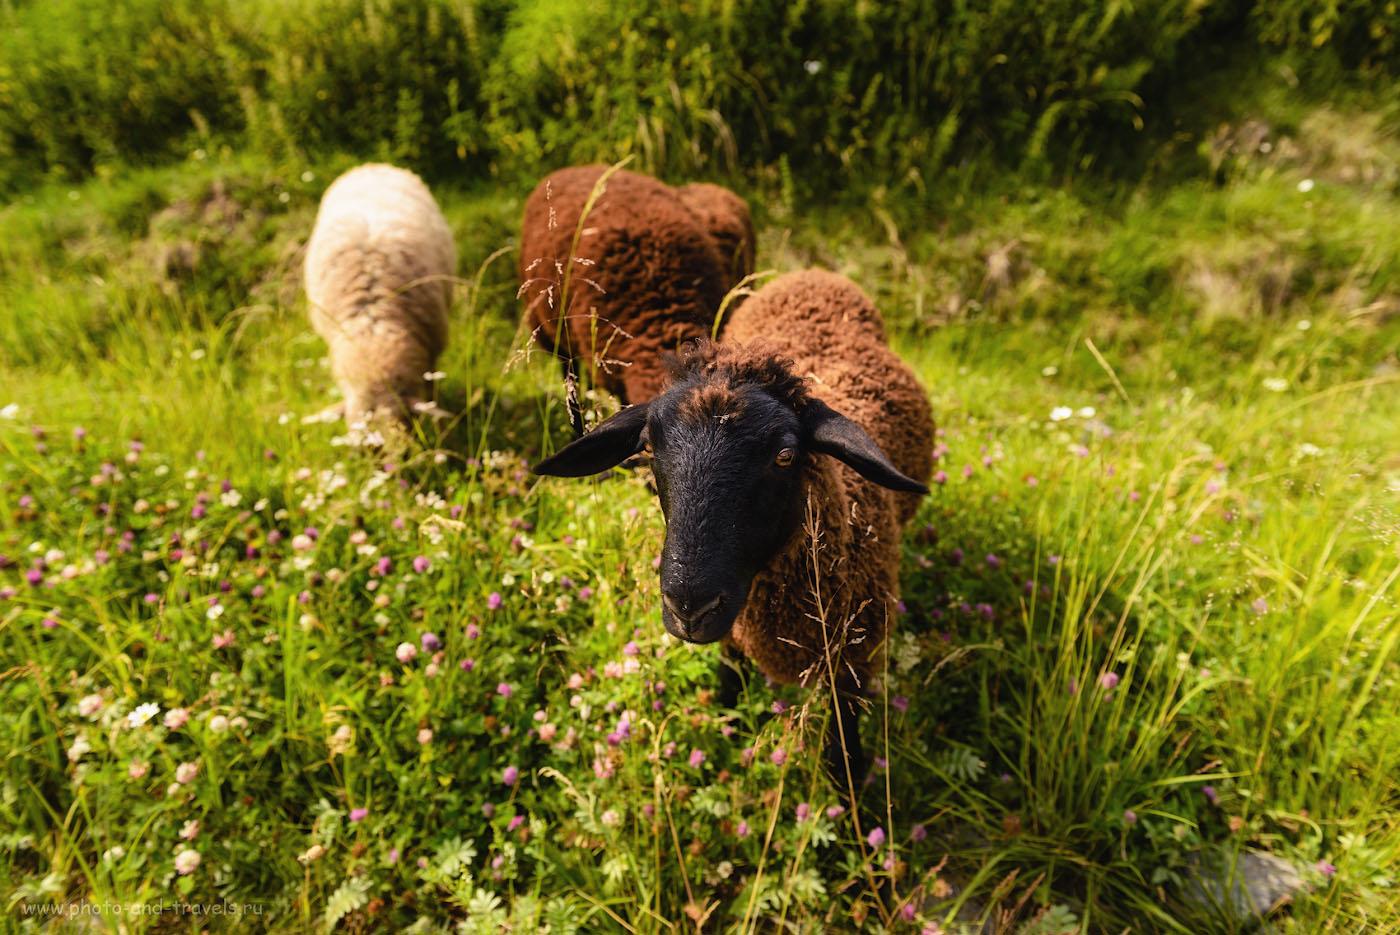 Снимок 8. Овца на ферме в Висиме. 1/125, -0.33, 4.5, 100, 24.